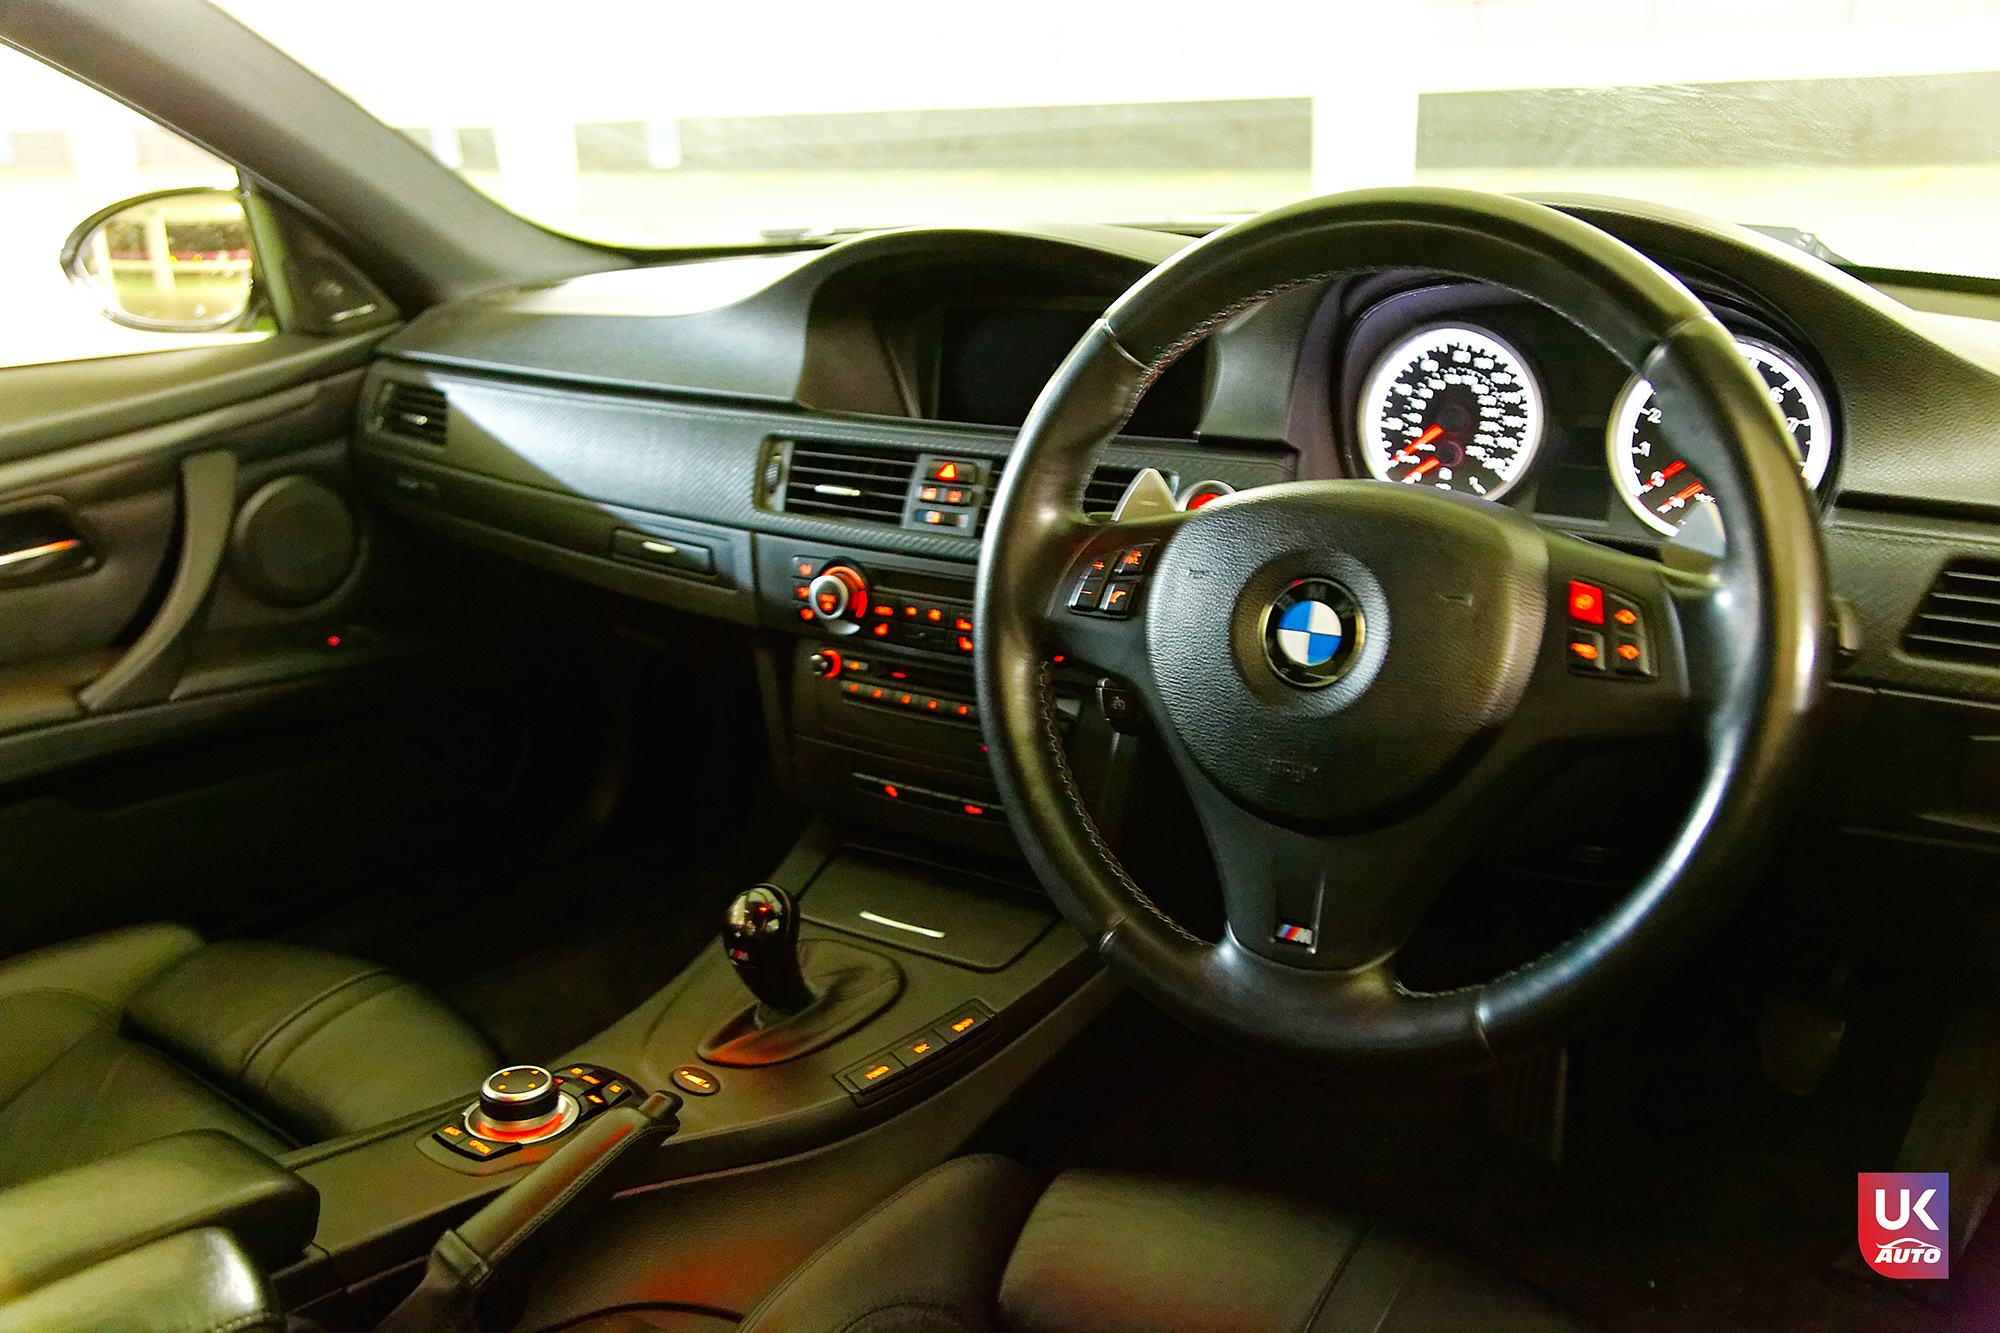 BMW m3 E92 import auto mandataire angleterre uk londres bmw leboncoin achat angleterre bmw voiture anglaise auto rhd e92 uk auto14 - Felecitation a Clement pour cette BMW M3 E92 COUPE RHD PACK CARBON BMW ANGLETERRE VOITURE UK